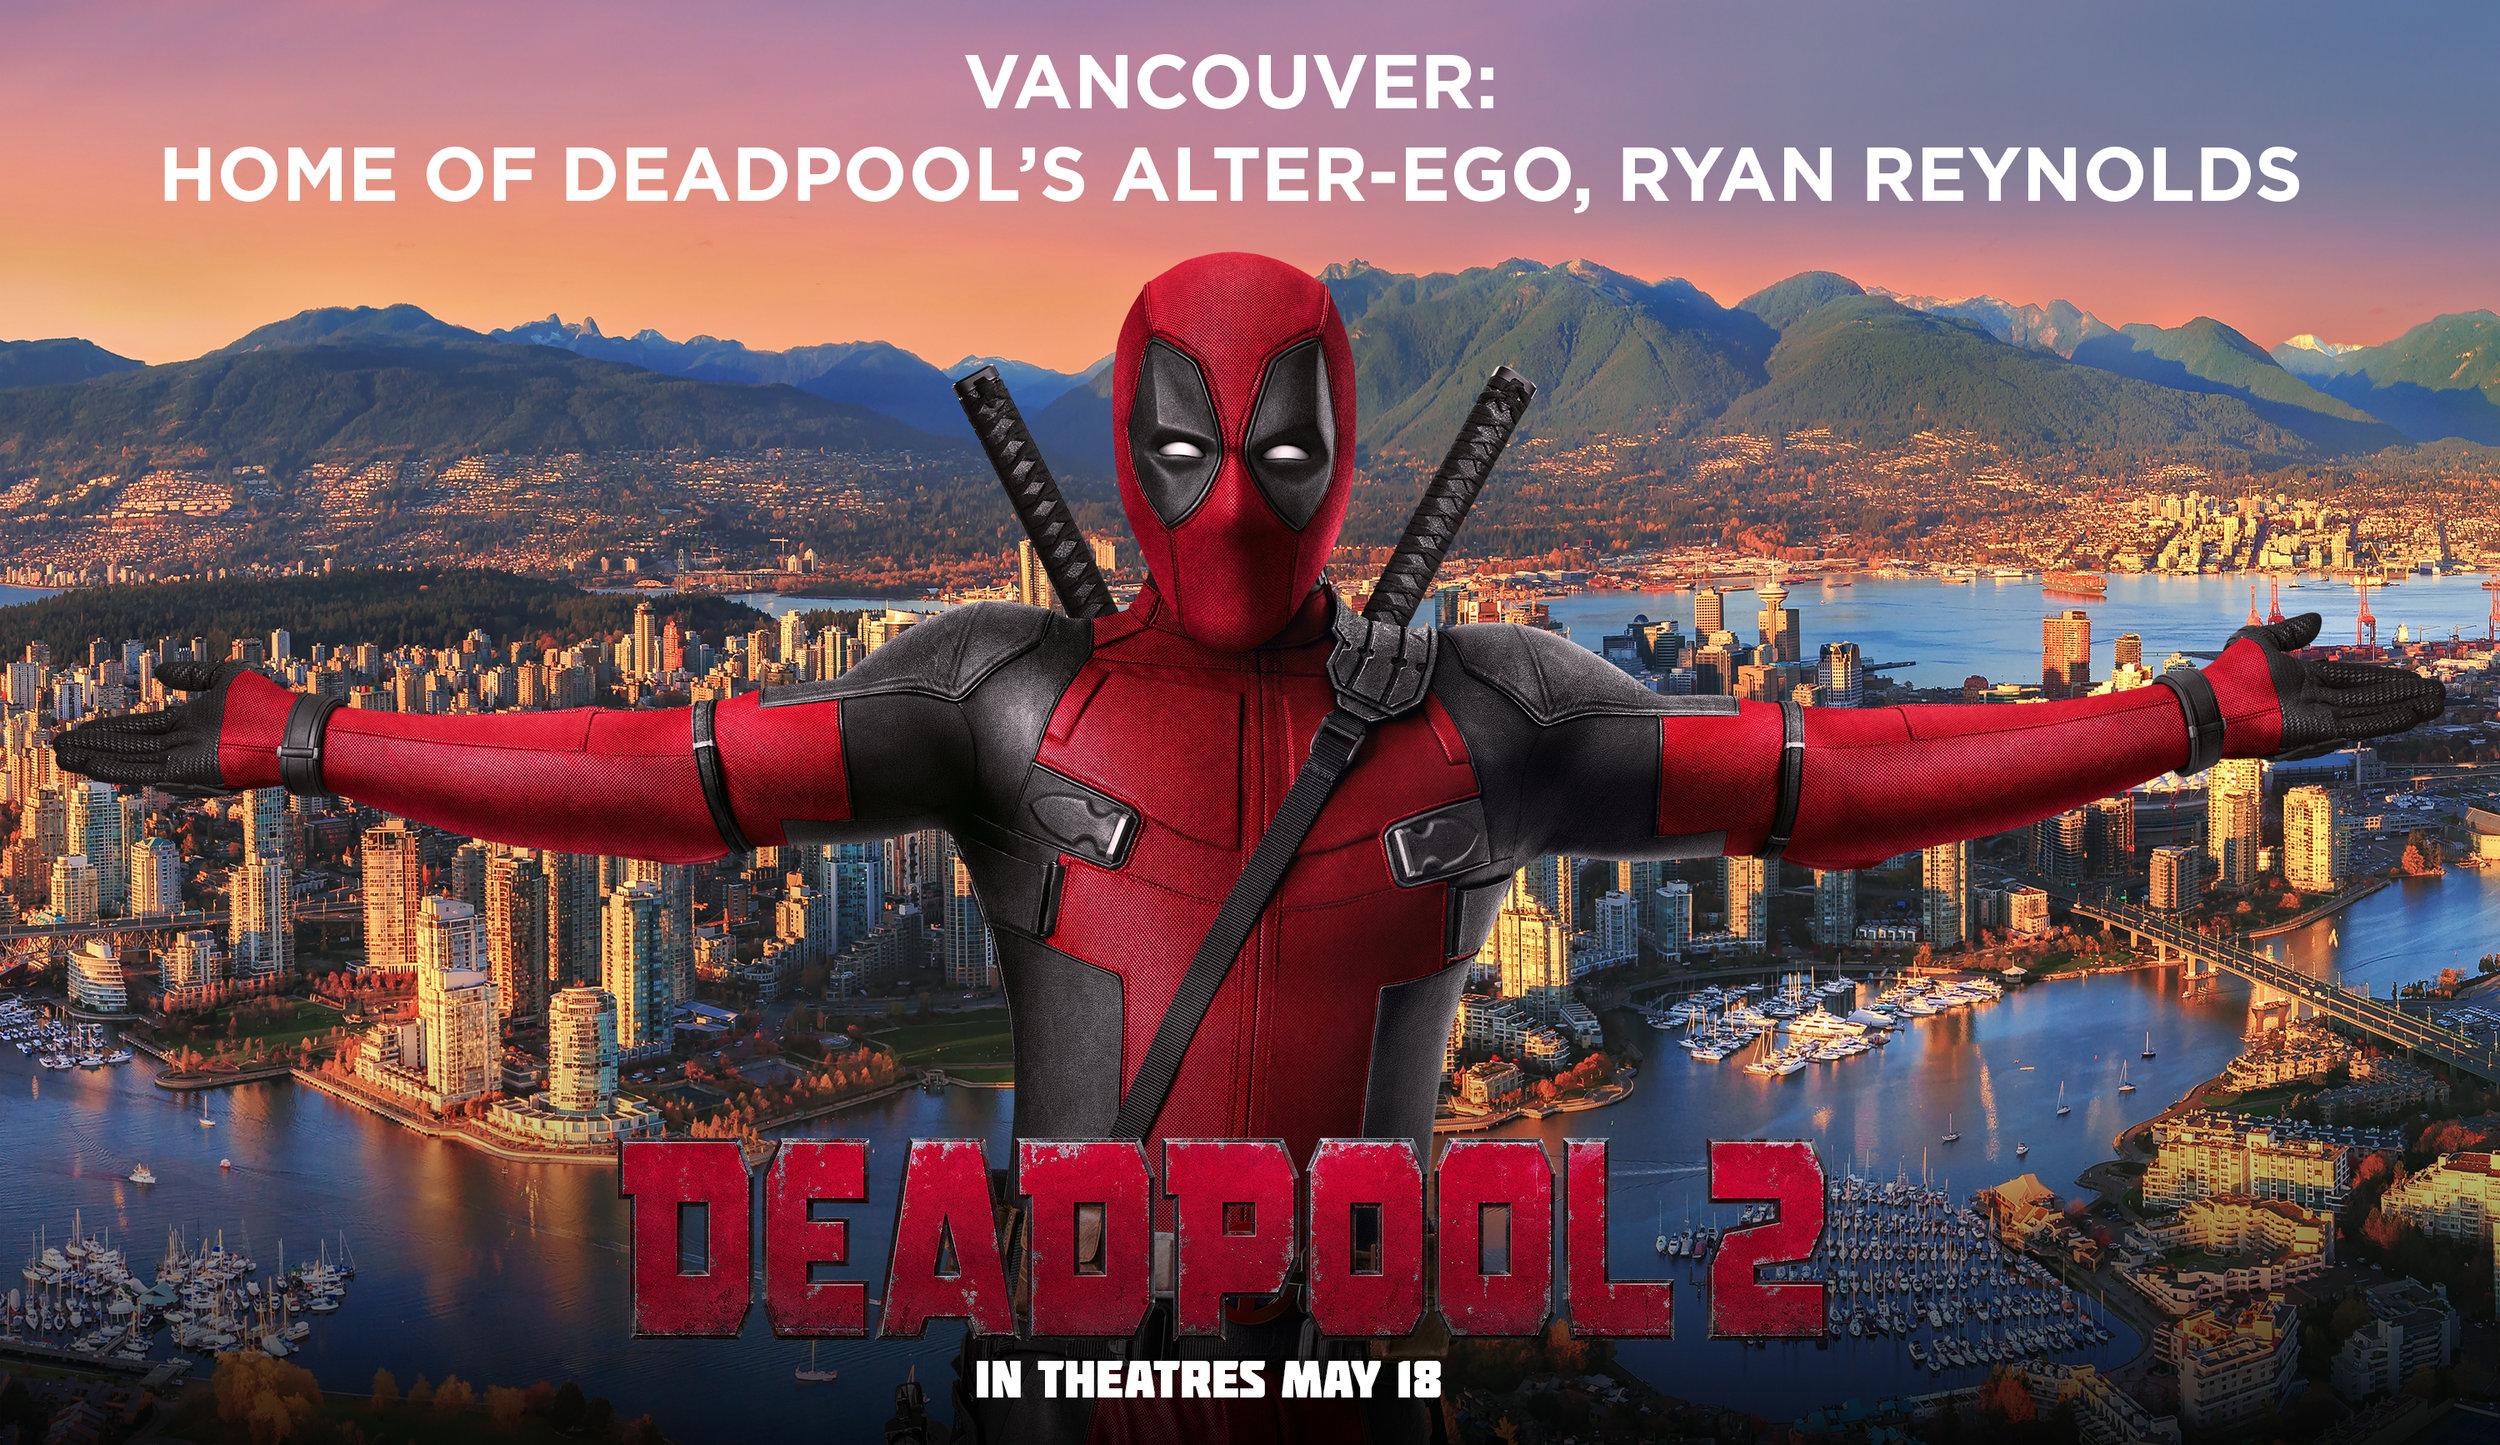 DP_Vancouver_HeaderV2.jpg